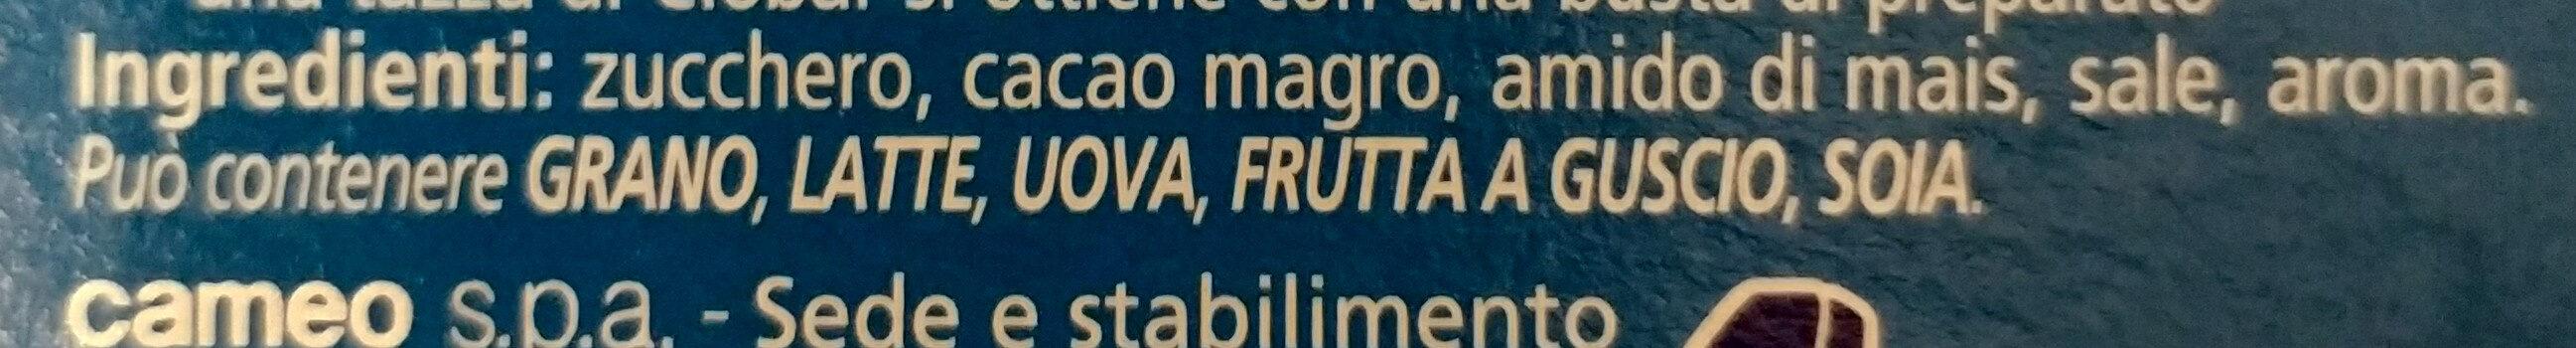 Cameo gusto classico - Ingredienti - it